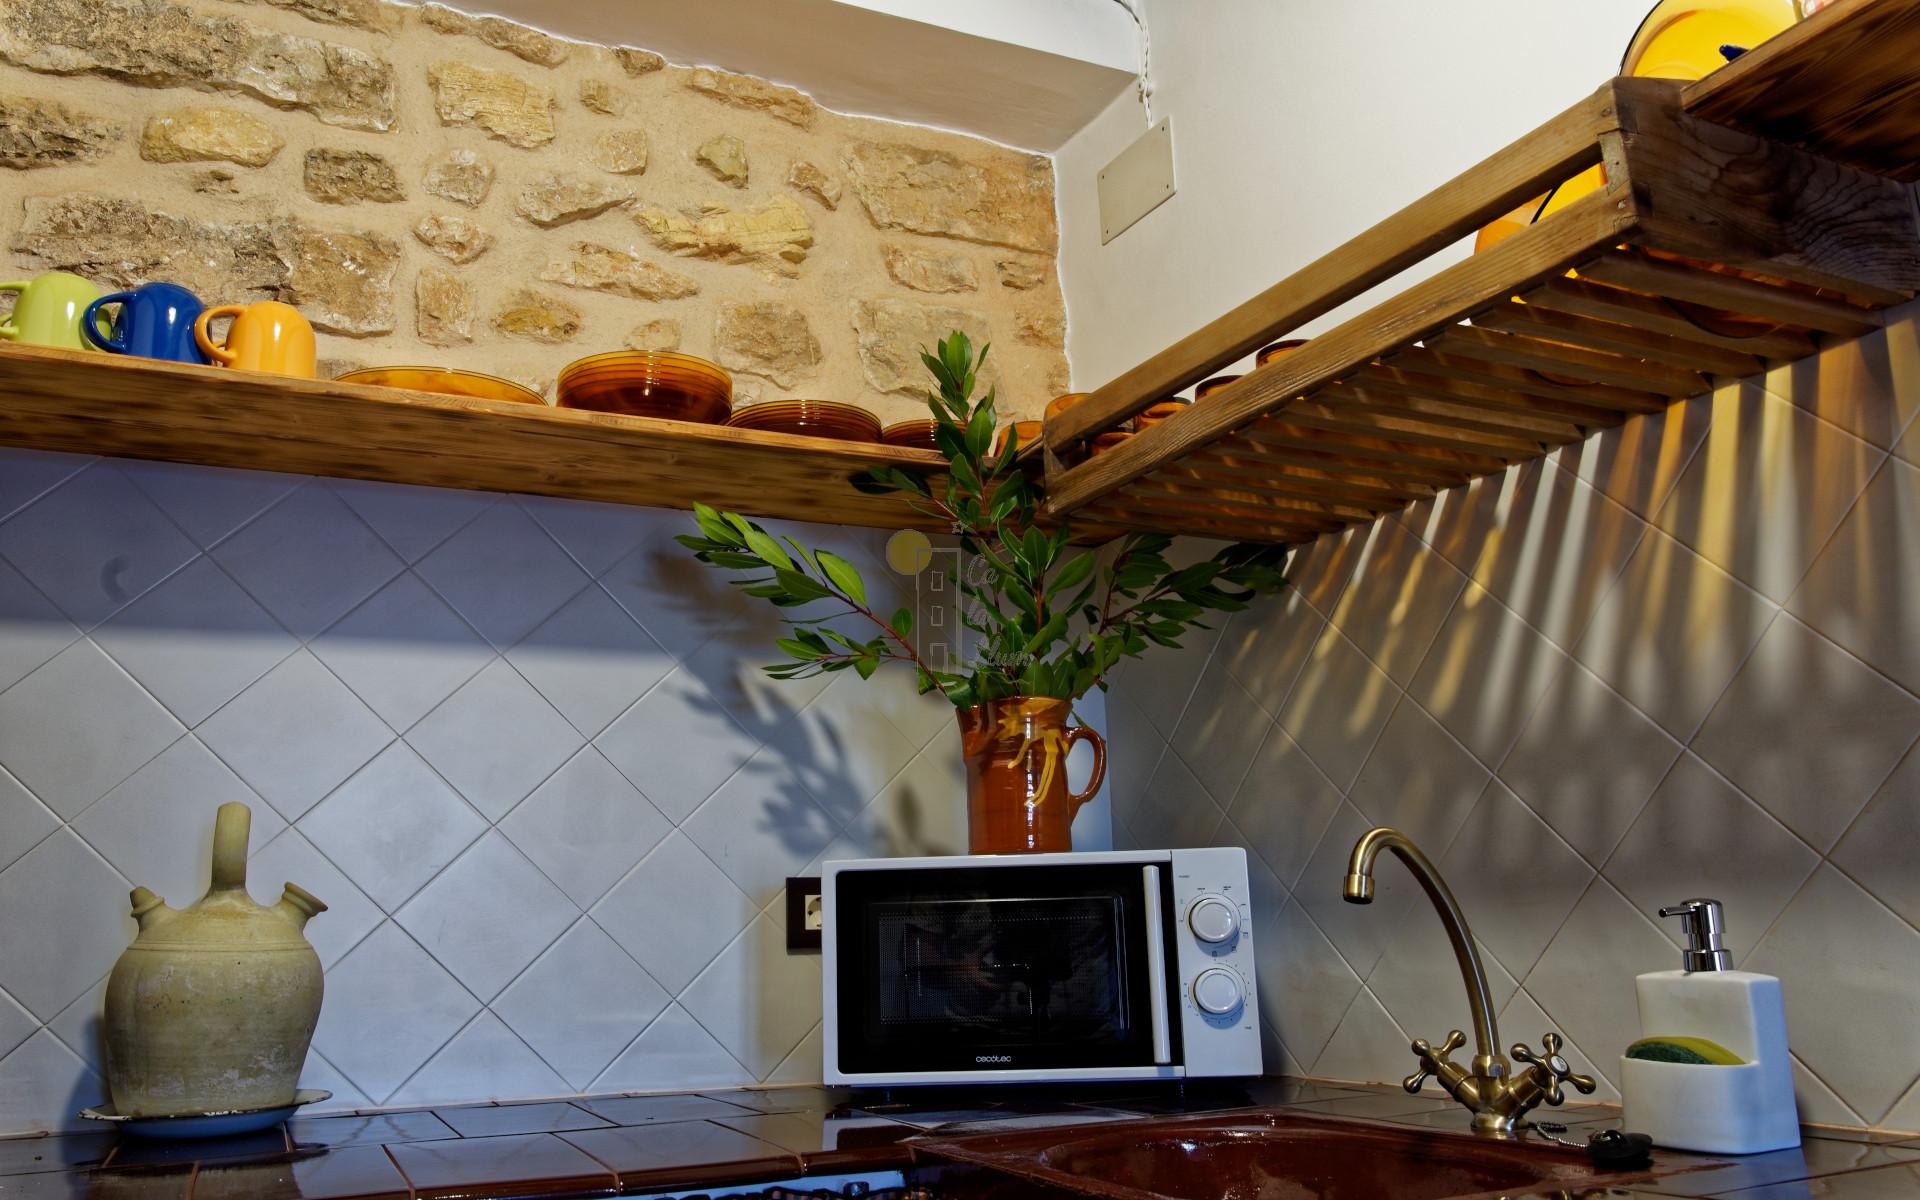 Cocina de Ca la Llum, la casa más acogedora de Tivissa